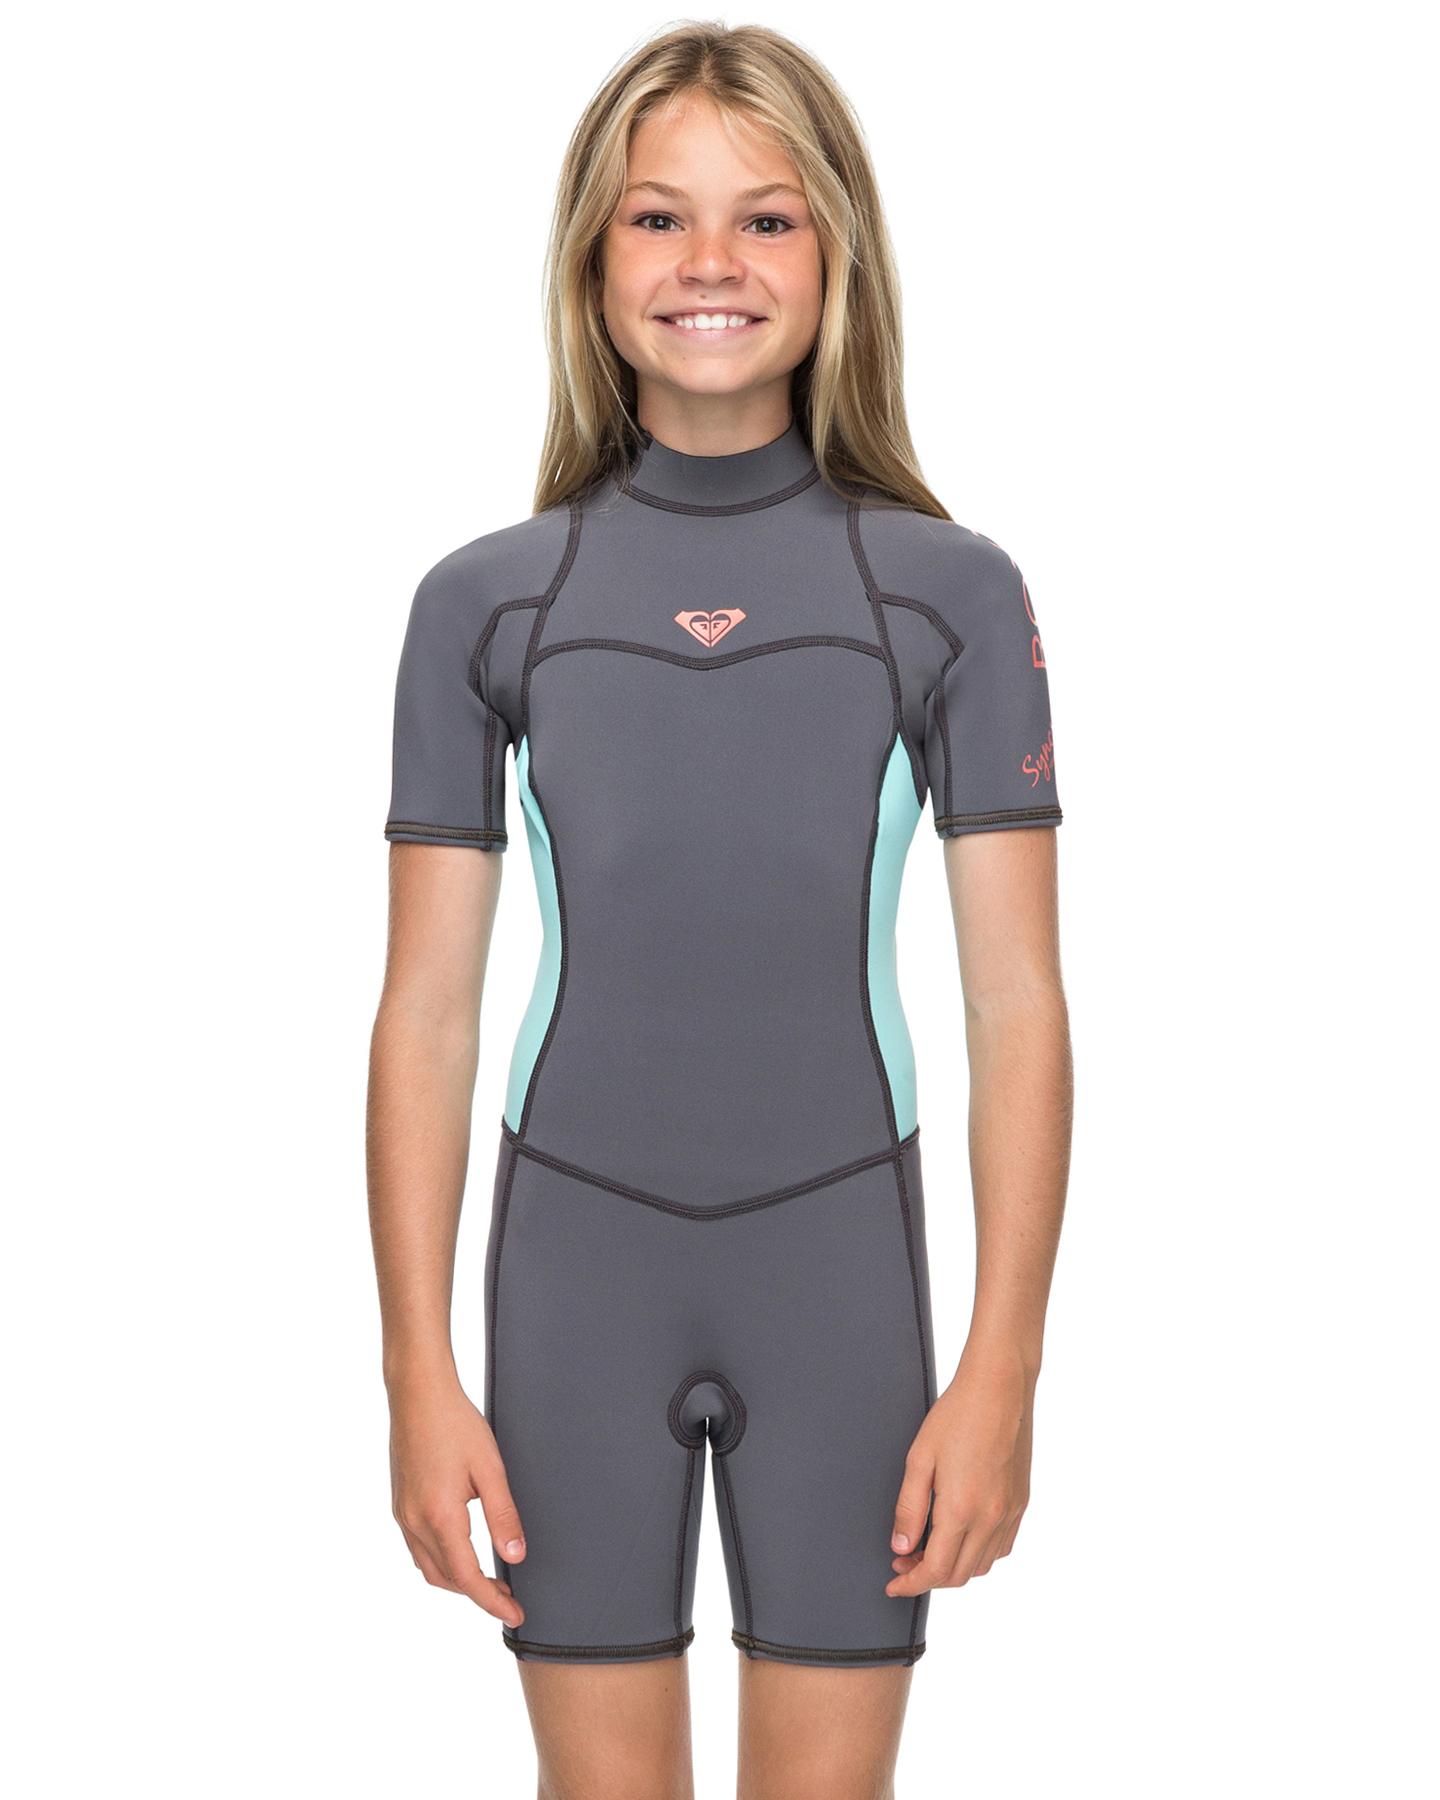 e6d146bb122e Roxy Girls Syncro Series 2Mm Flatlock Back Zip Ss Springsuit Wetsuit Deep  Grey Glace Blue Deep Grey Glace Blue Surfing Wetsuits Size 10 | Budget  Fashion ...